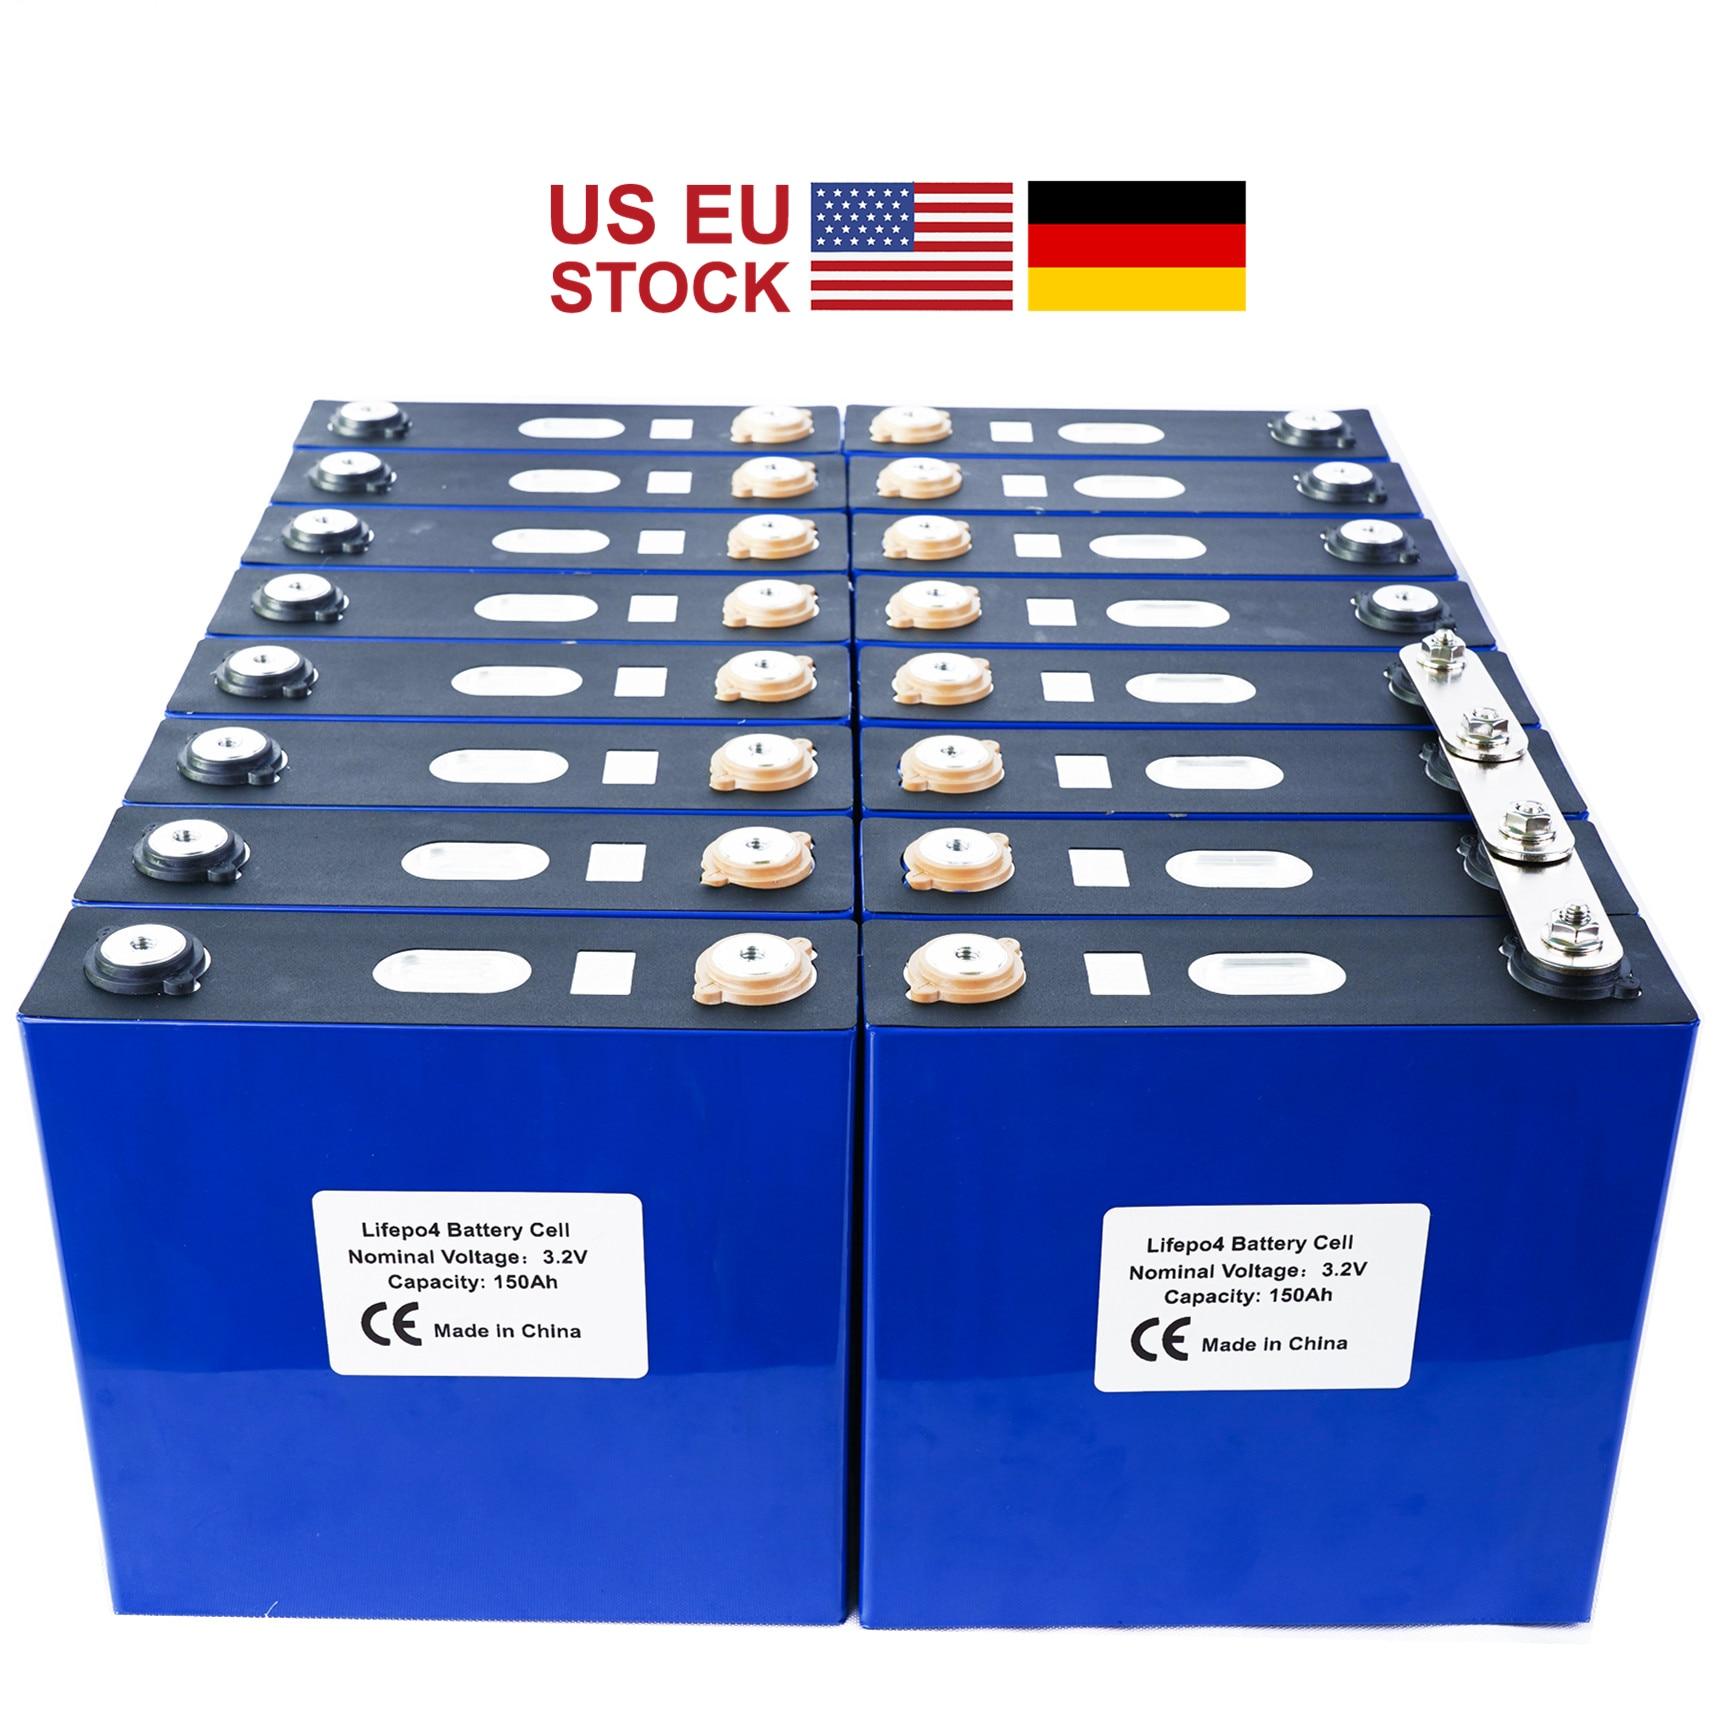 GRADE A 2020 NEW 16PCS 3.2V 120Ah 176Ah Lithium Iron Phosphate Lifepo4 Battery  Solar 24V 48V Cells Not 150Ah EU US TAX FREE